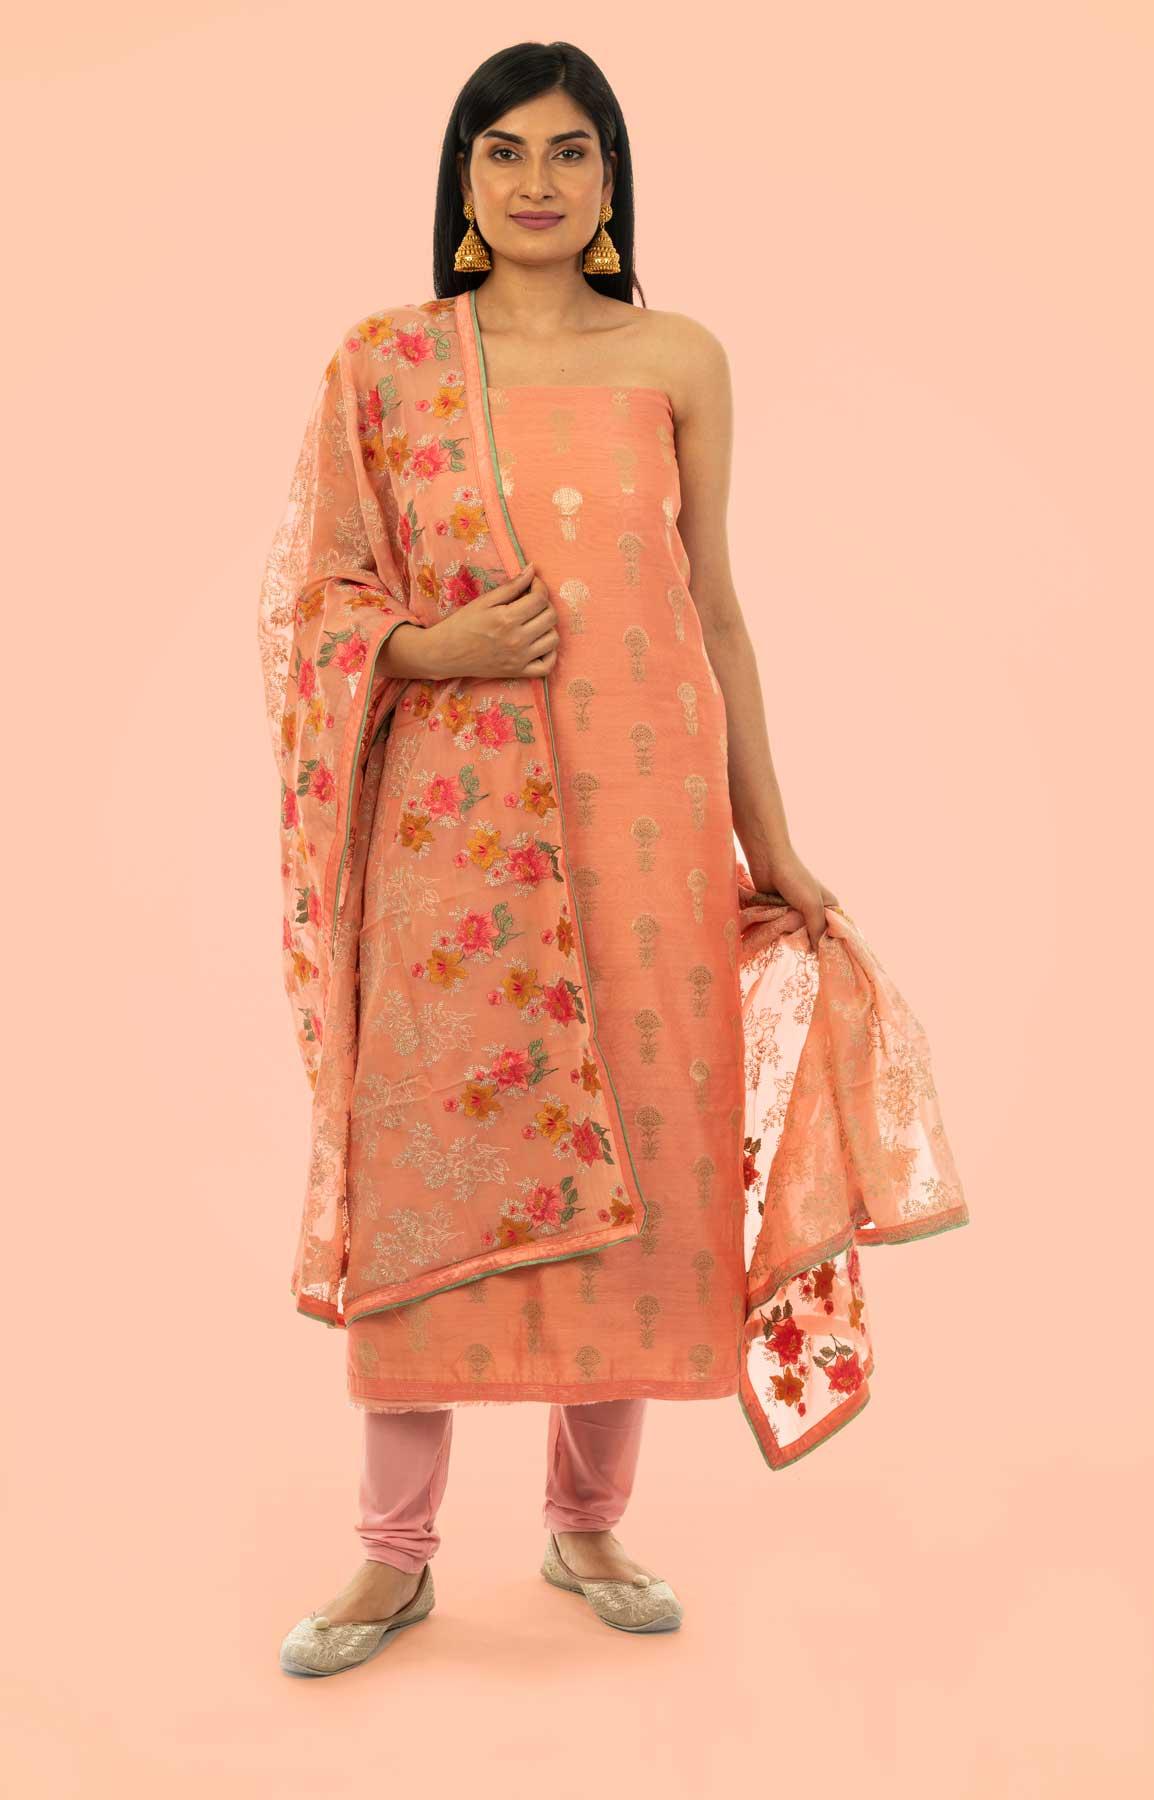 Peach Banarasi Chanderi Suit Fabric With Phulkari Dupatta – Viraaya By Ushnakmals